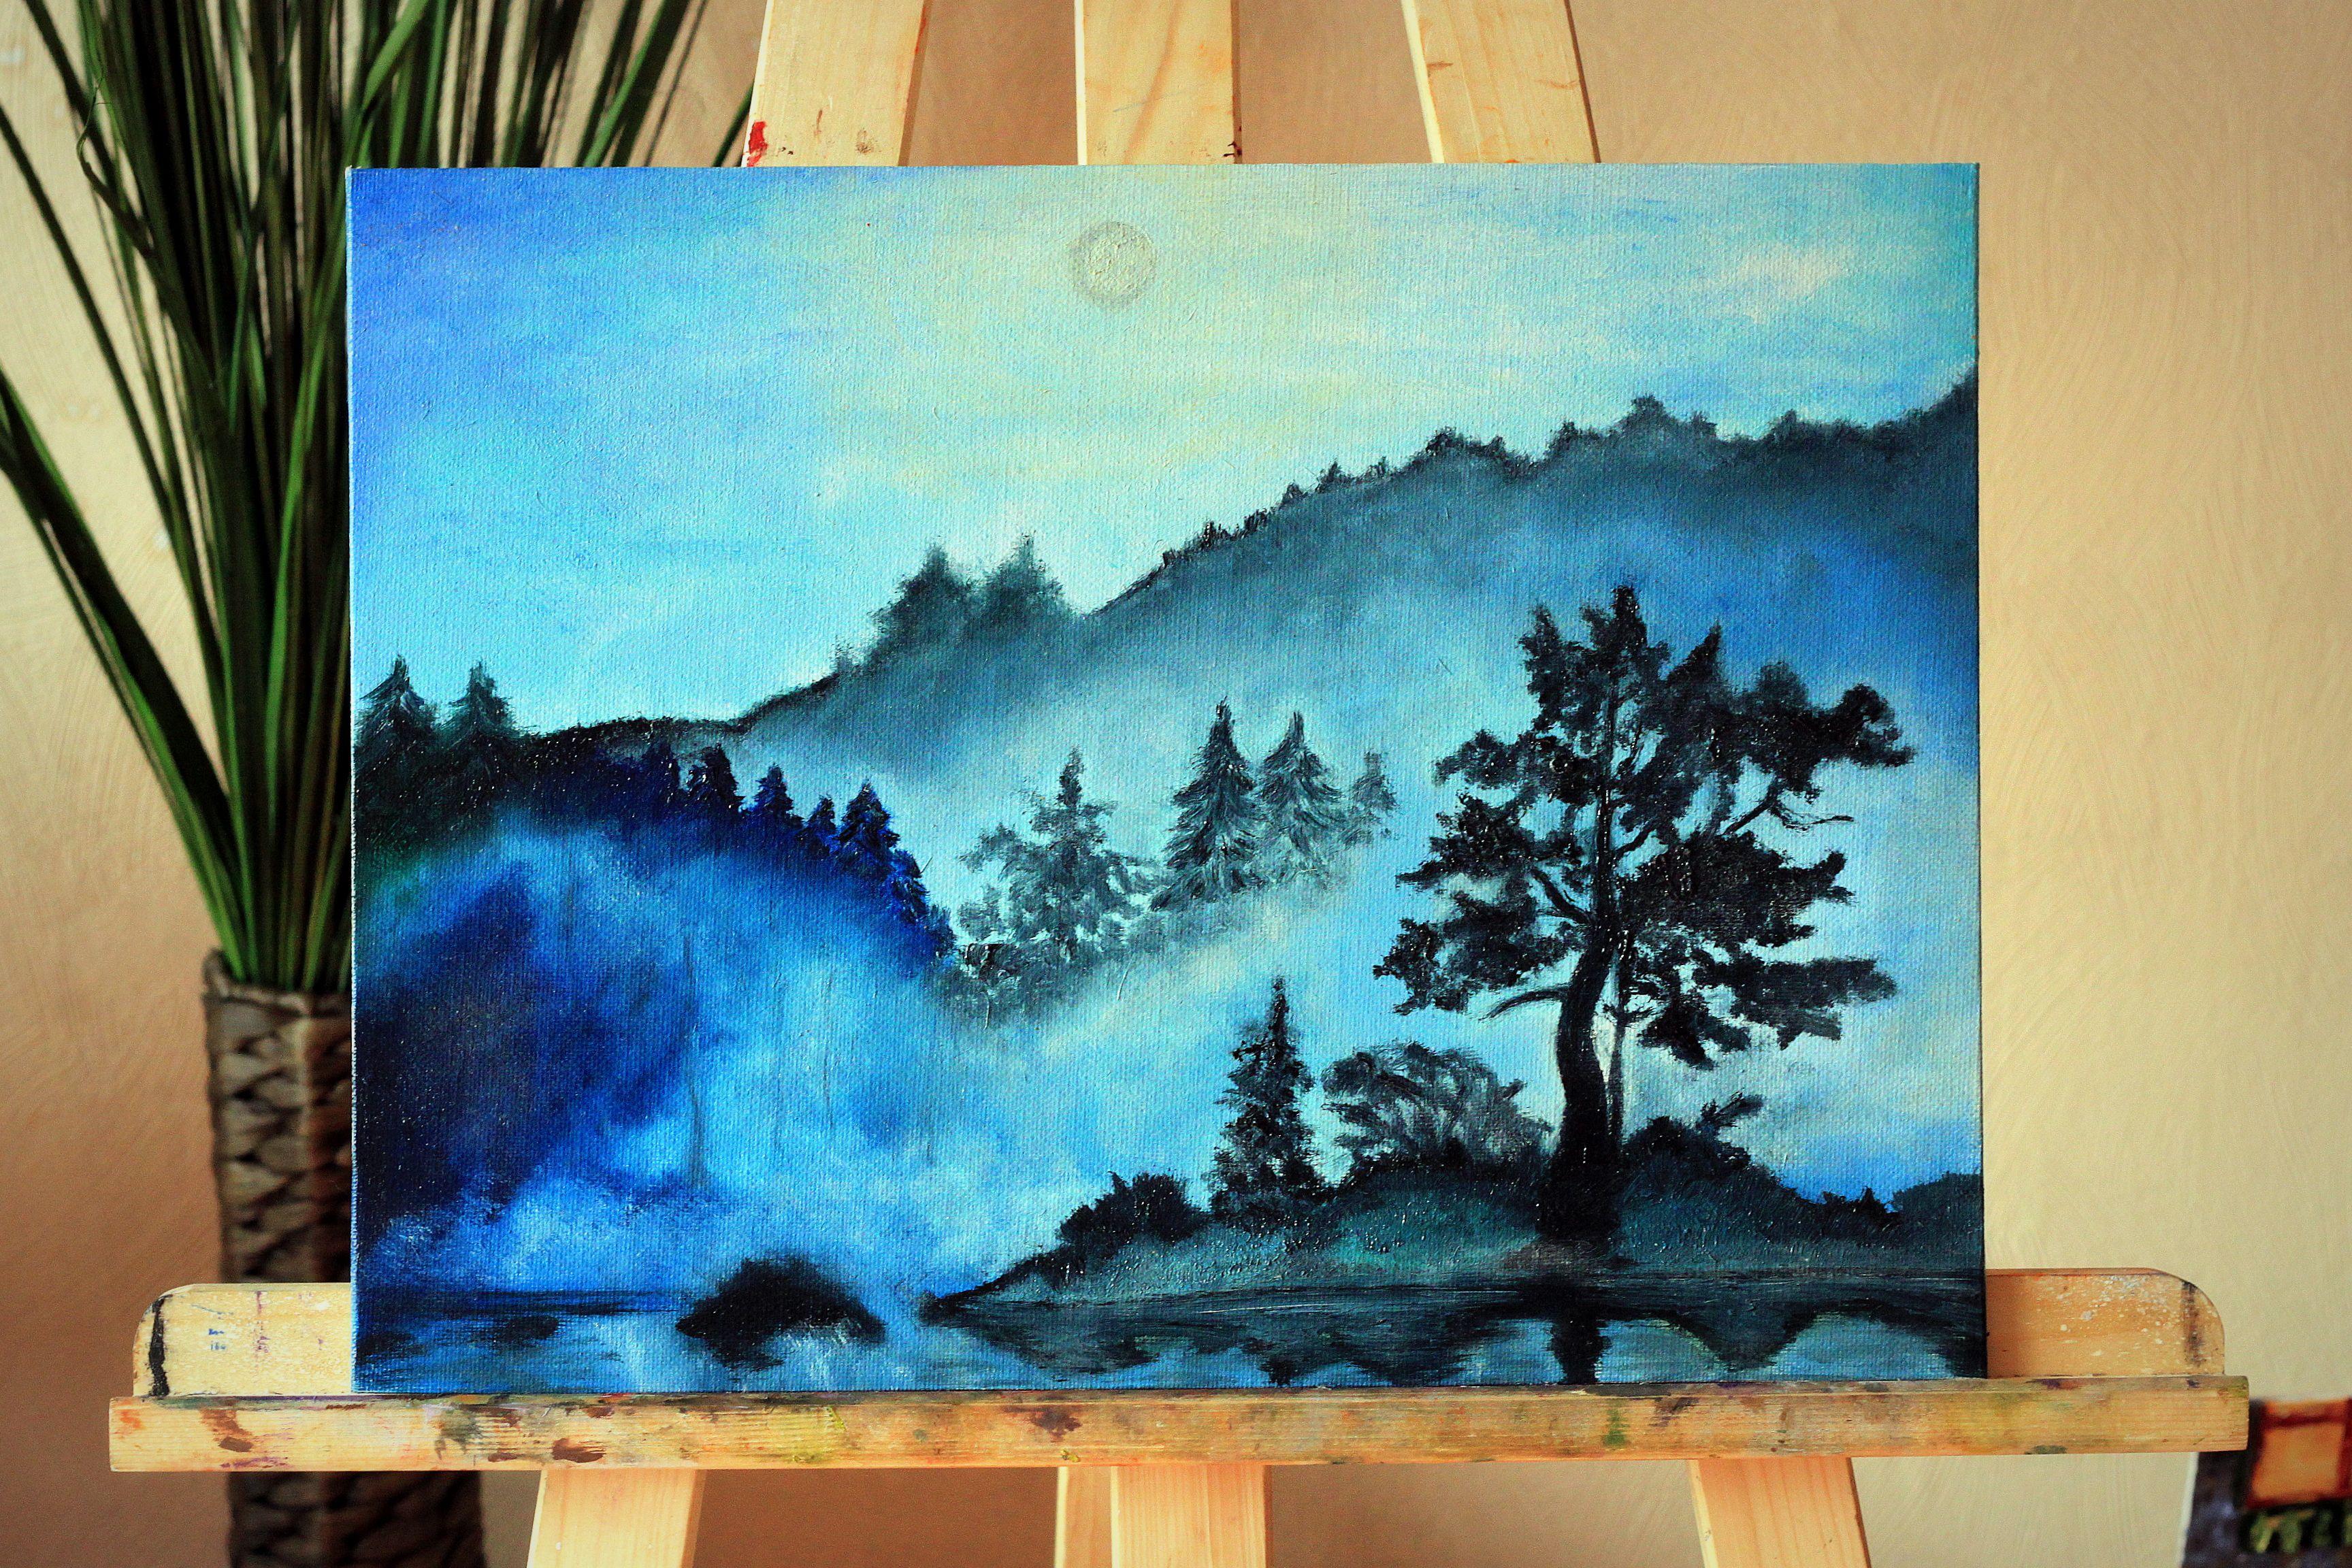 холст масло вода горы туман лес